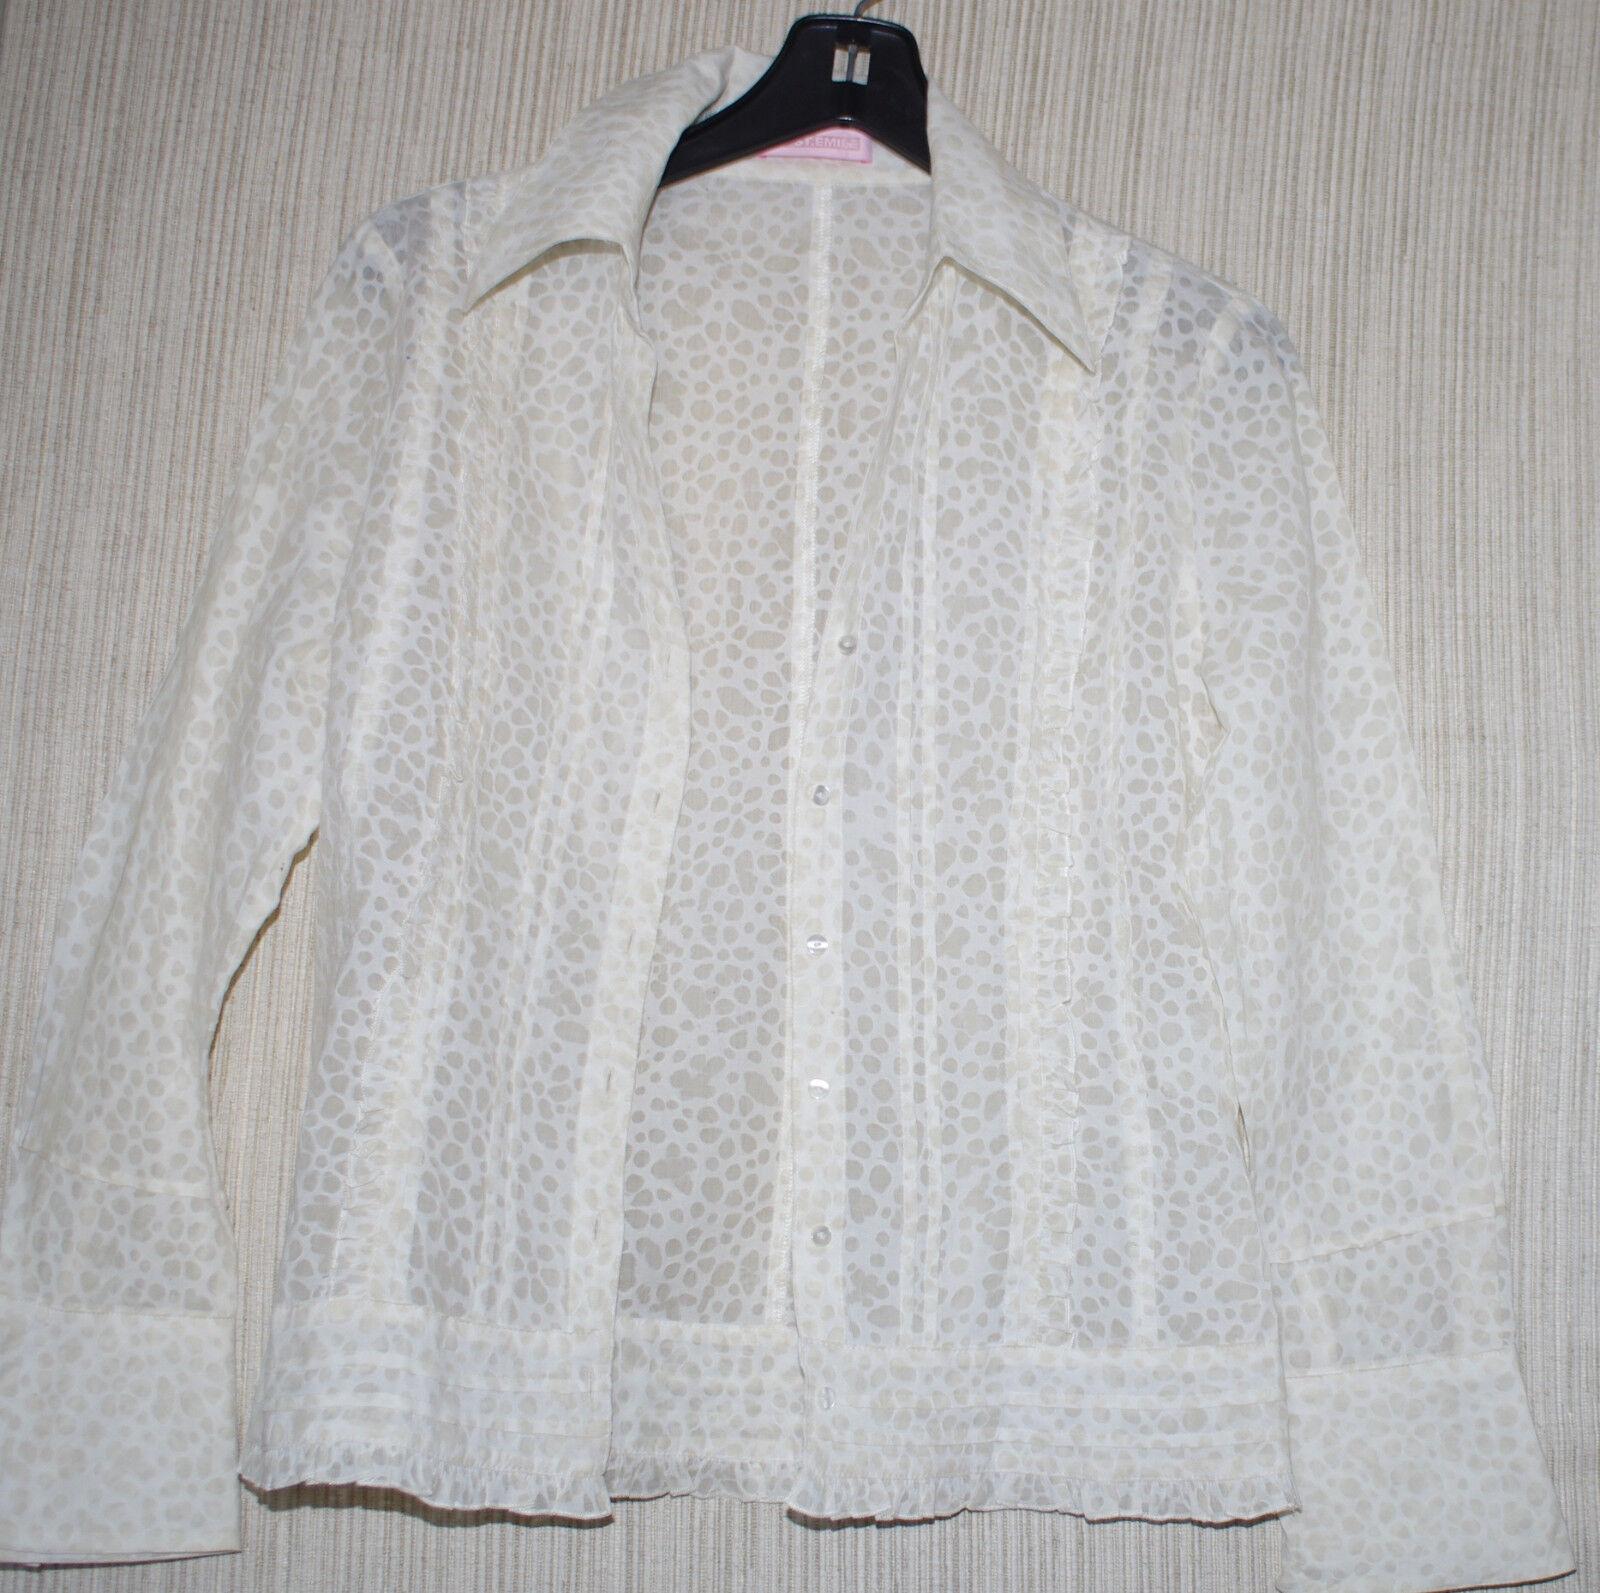 St.emile Cream Cotton Beige Print Blouse Button-down Top Größe  6